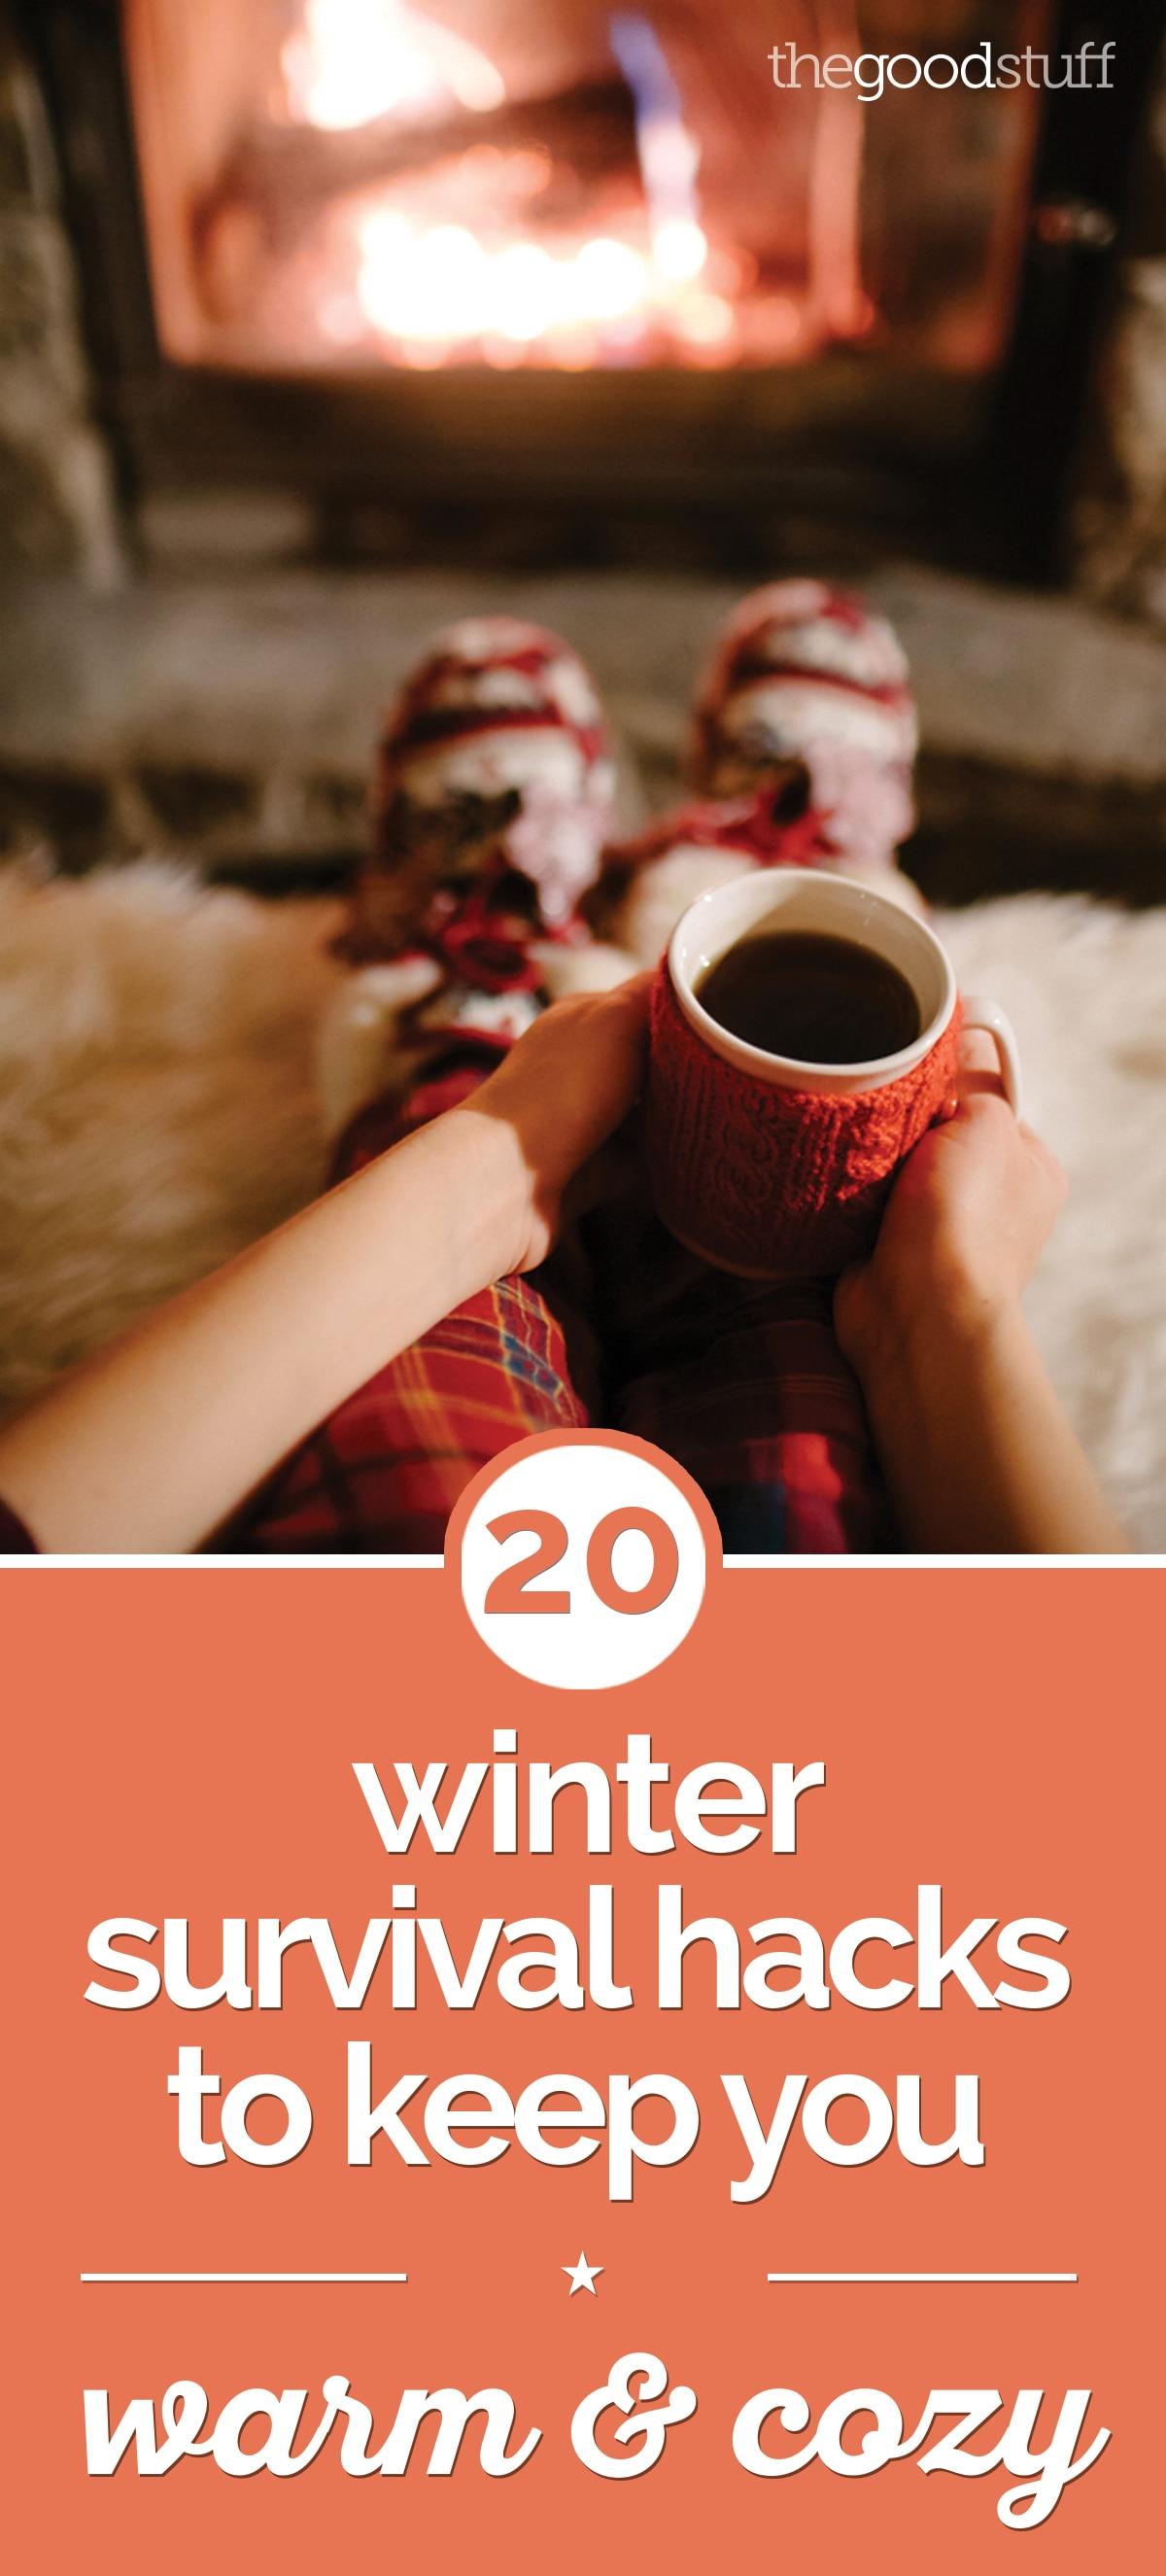 20 Winter Survival Hacks to Keep You Warm & Cozy | thegoodstuff